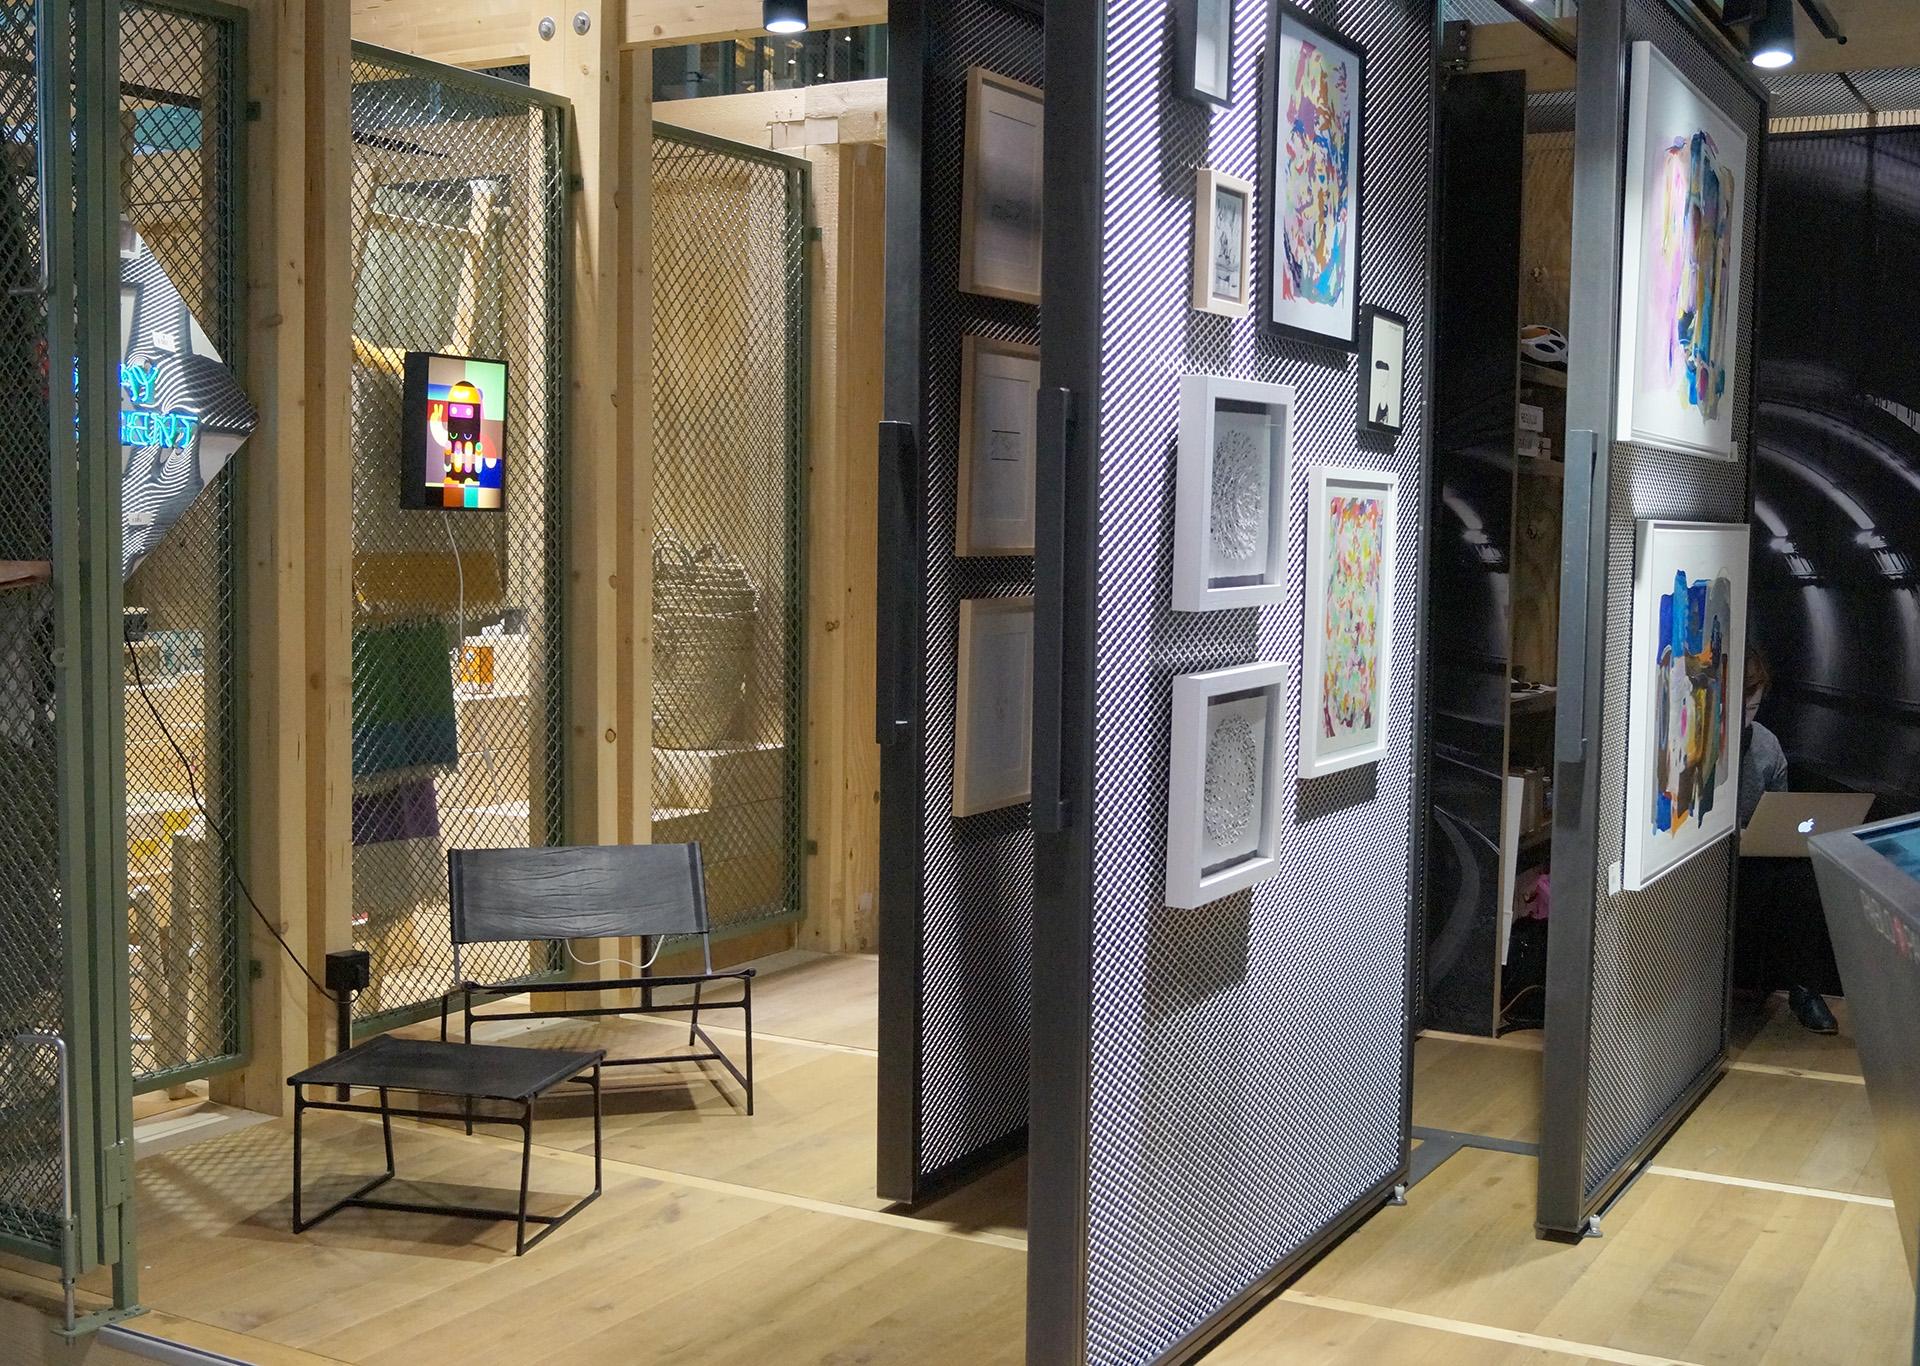 call for performance artists pablo paul blog. Black Bedroom Furniture Sets. Home Design Ideas